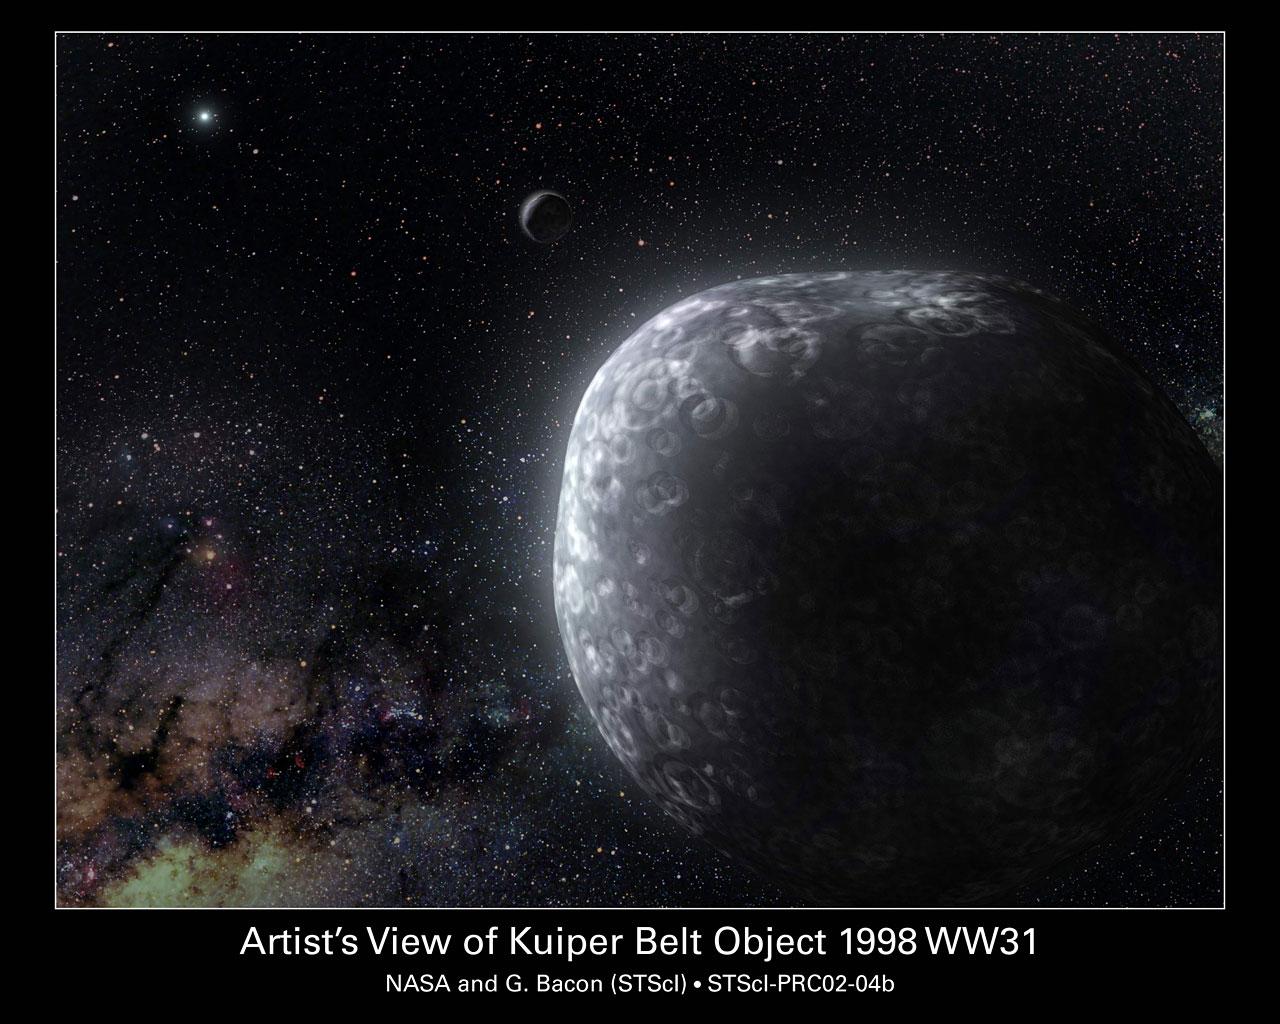 Artist's View of Kuiper Belt Object 1998 WW31